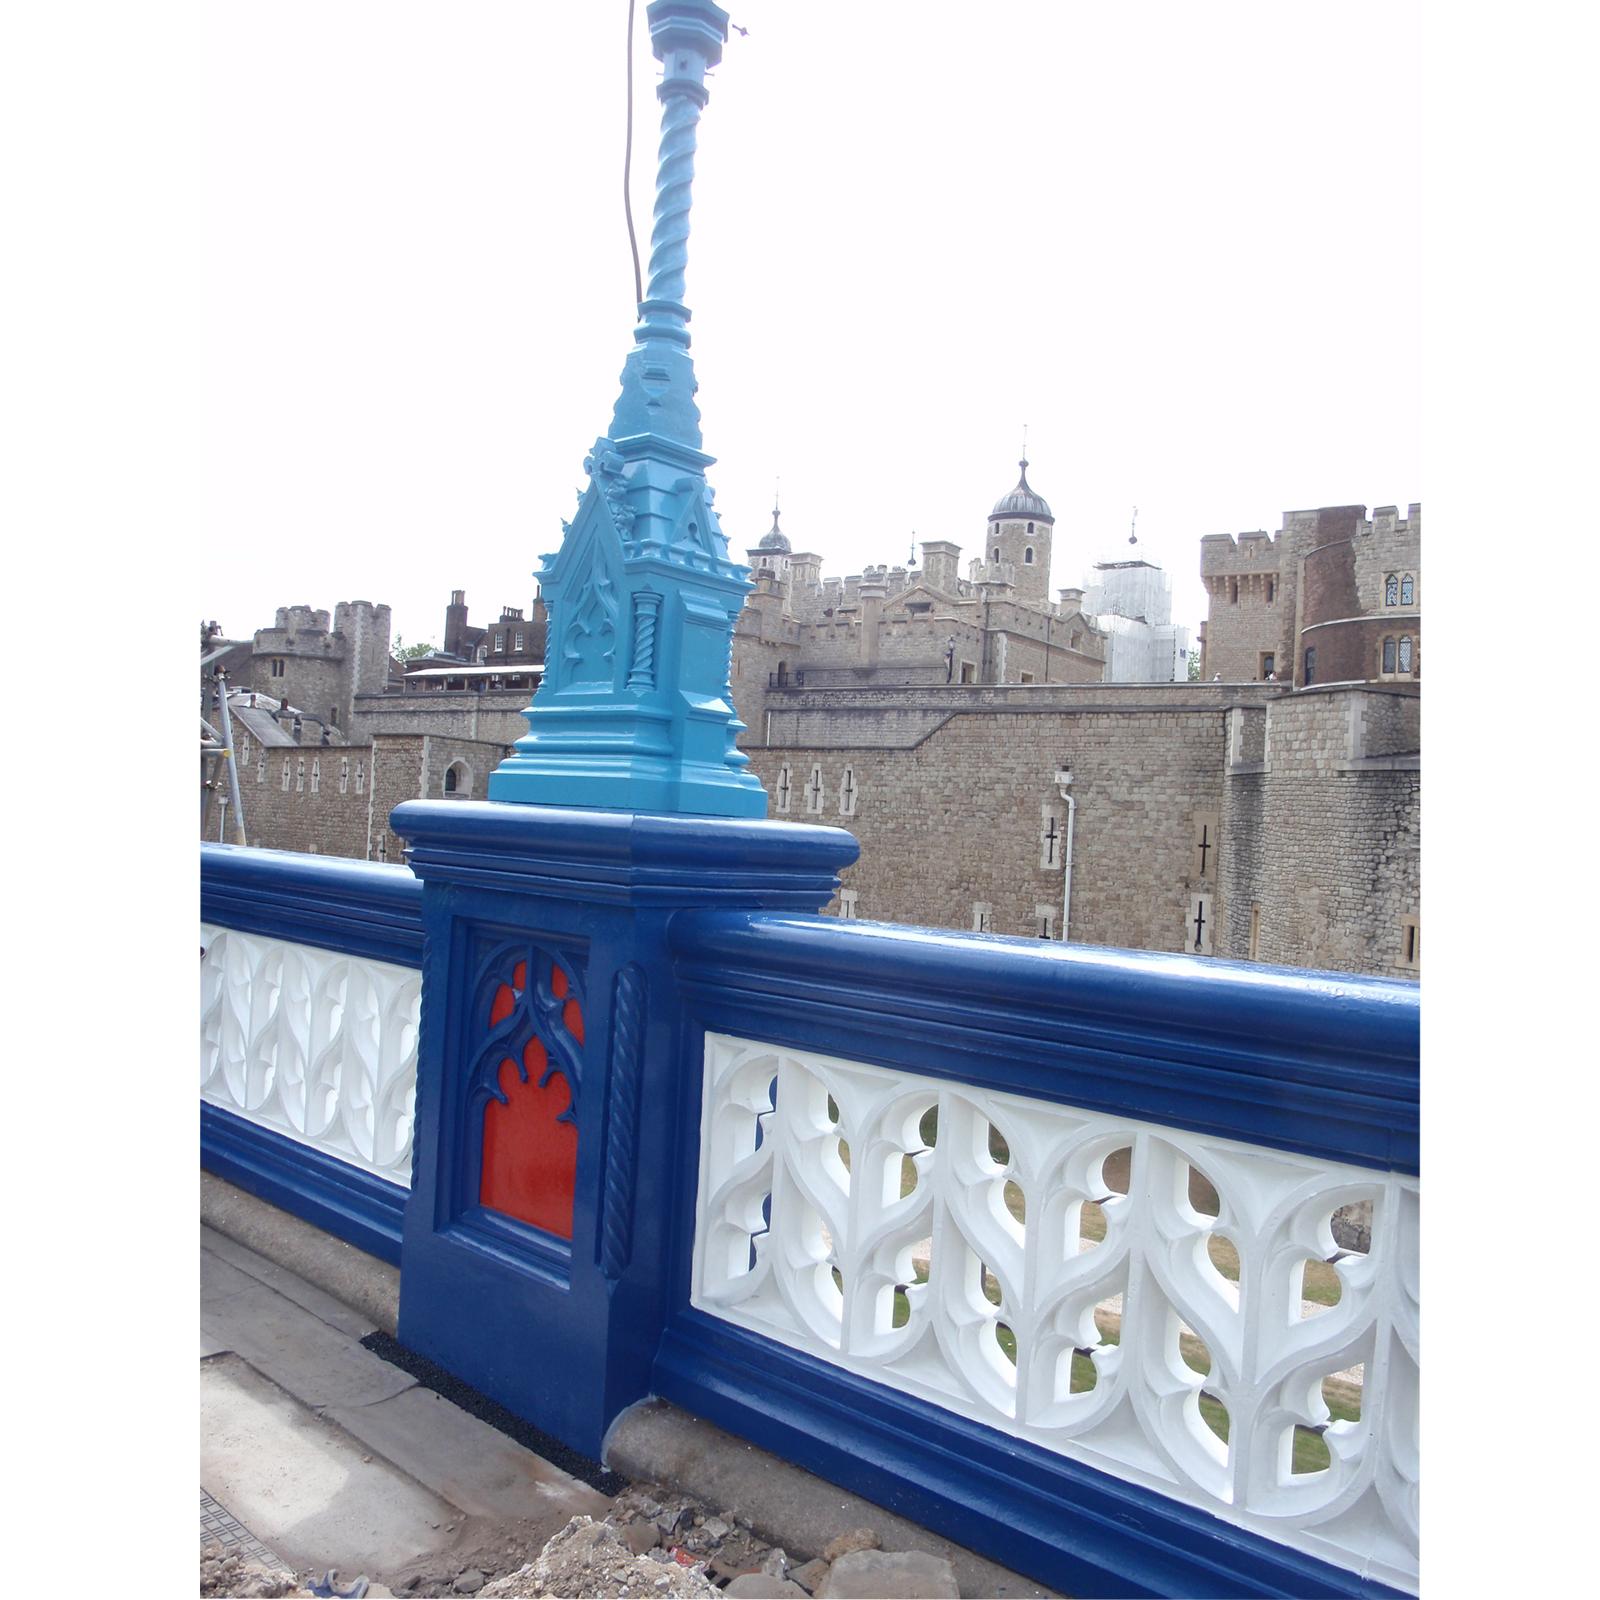 londontowerbridge2